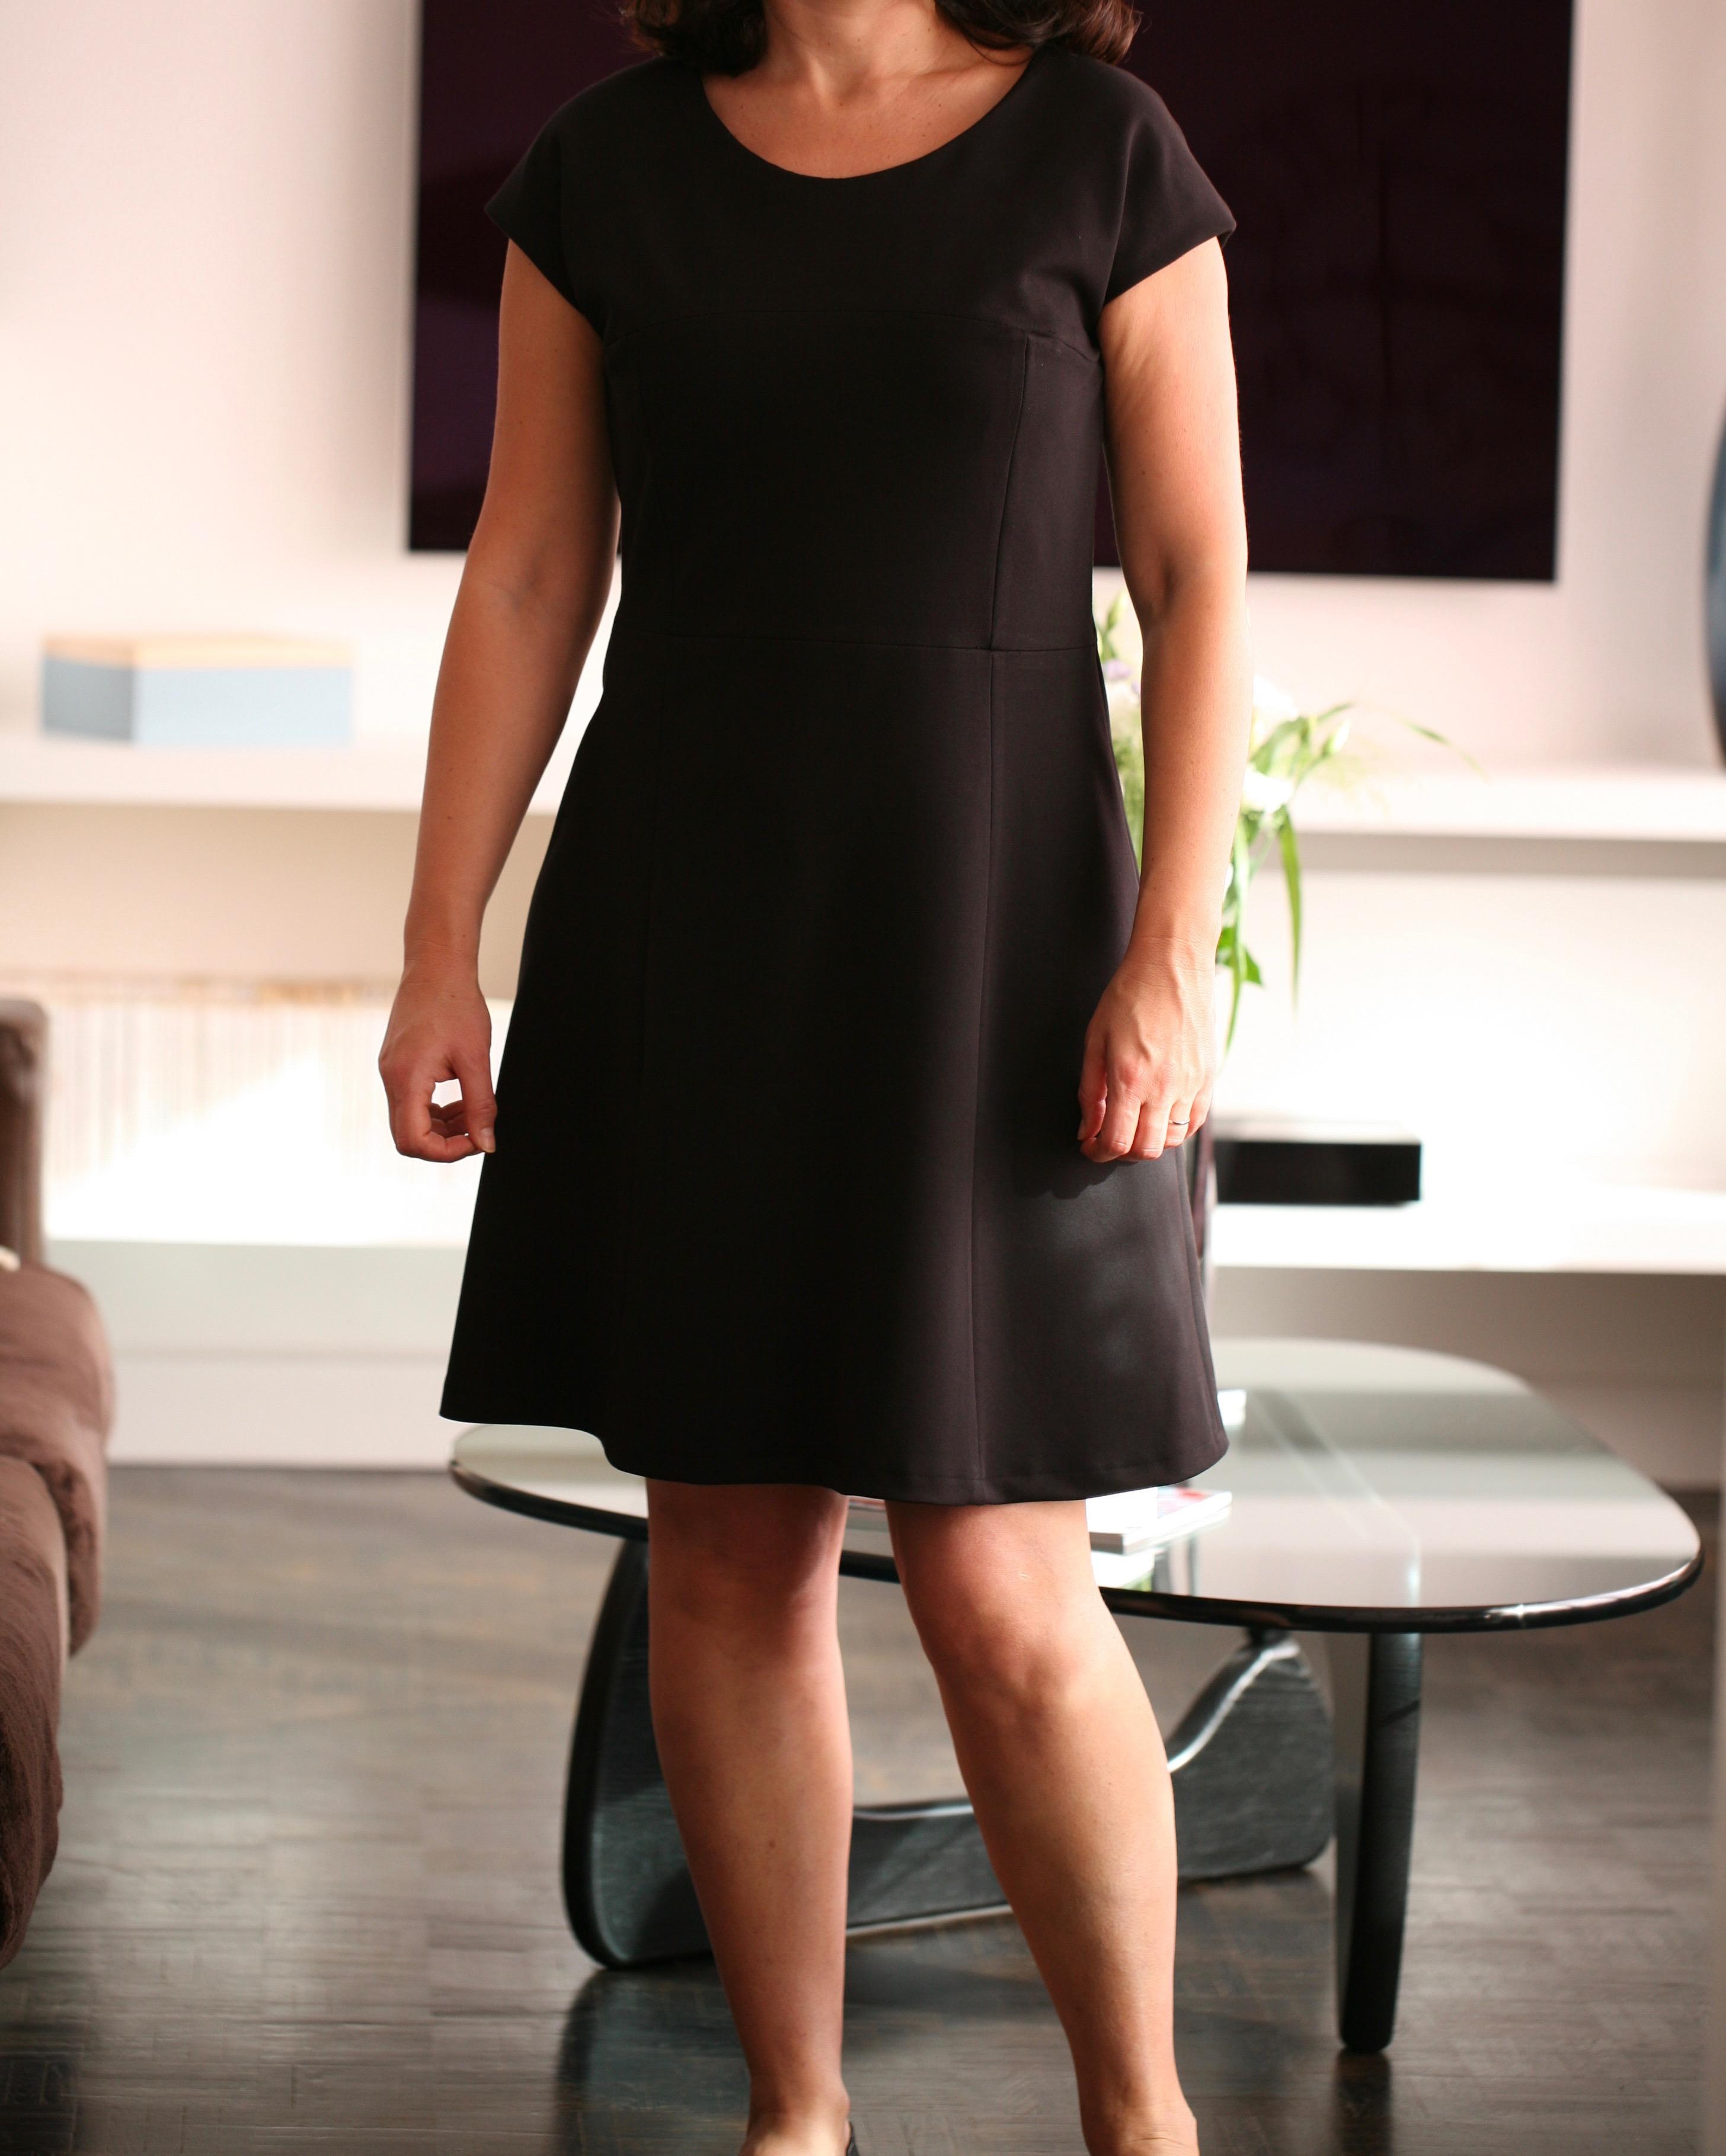 Robe Madeline - La Maison Victor - Couture en coulisse